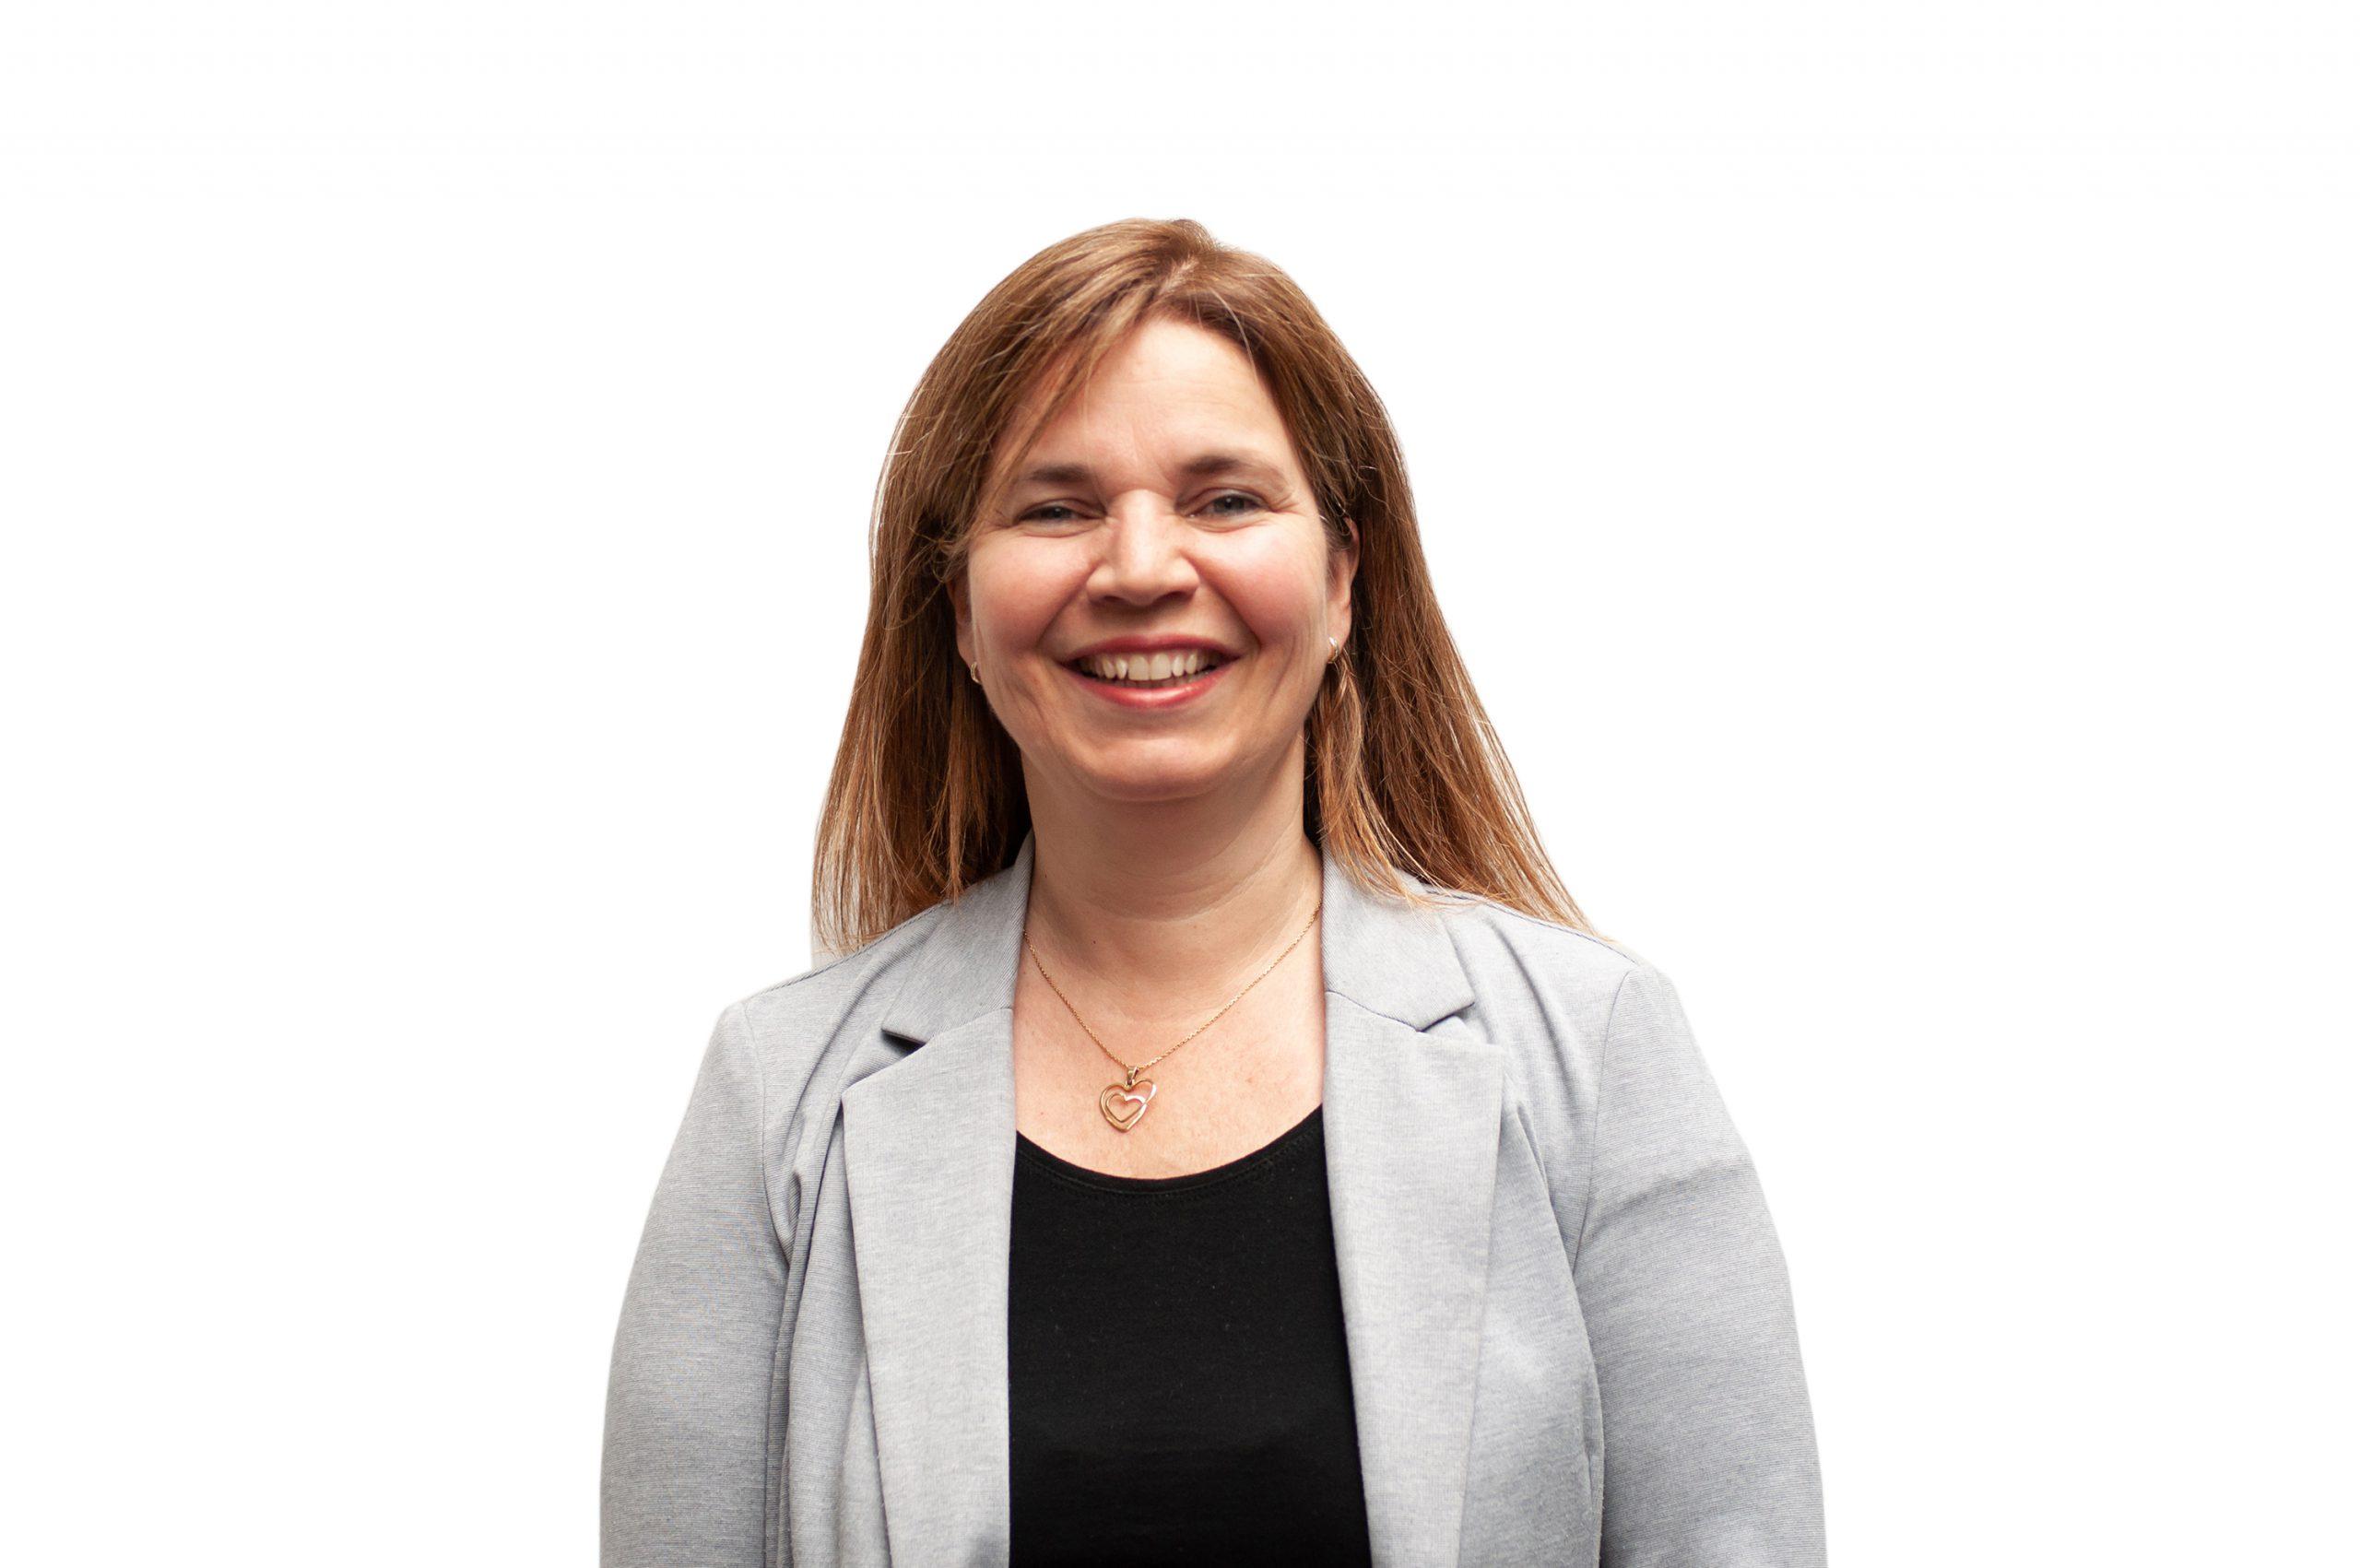 Miranda Schuurman